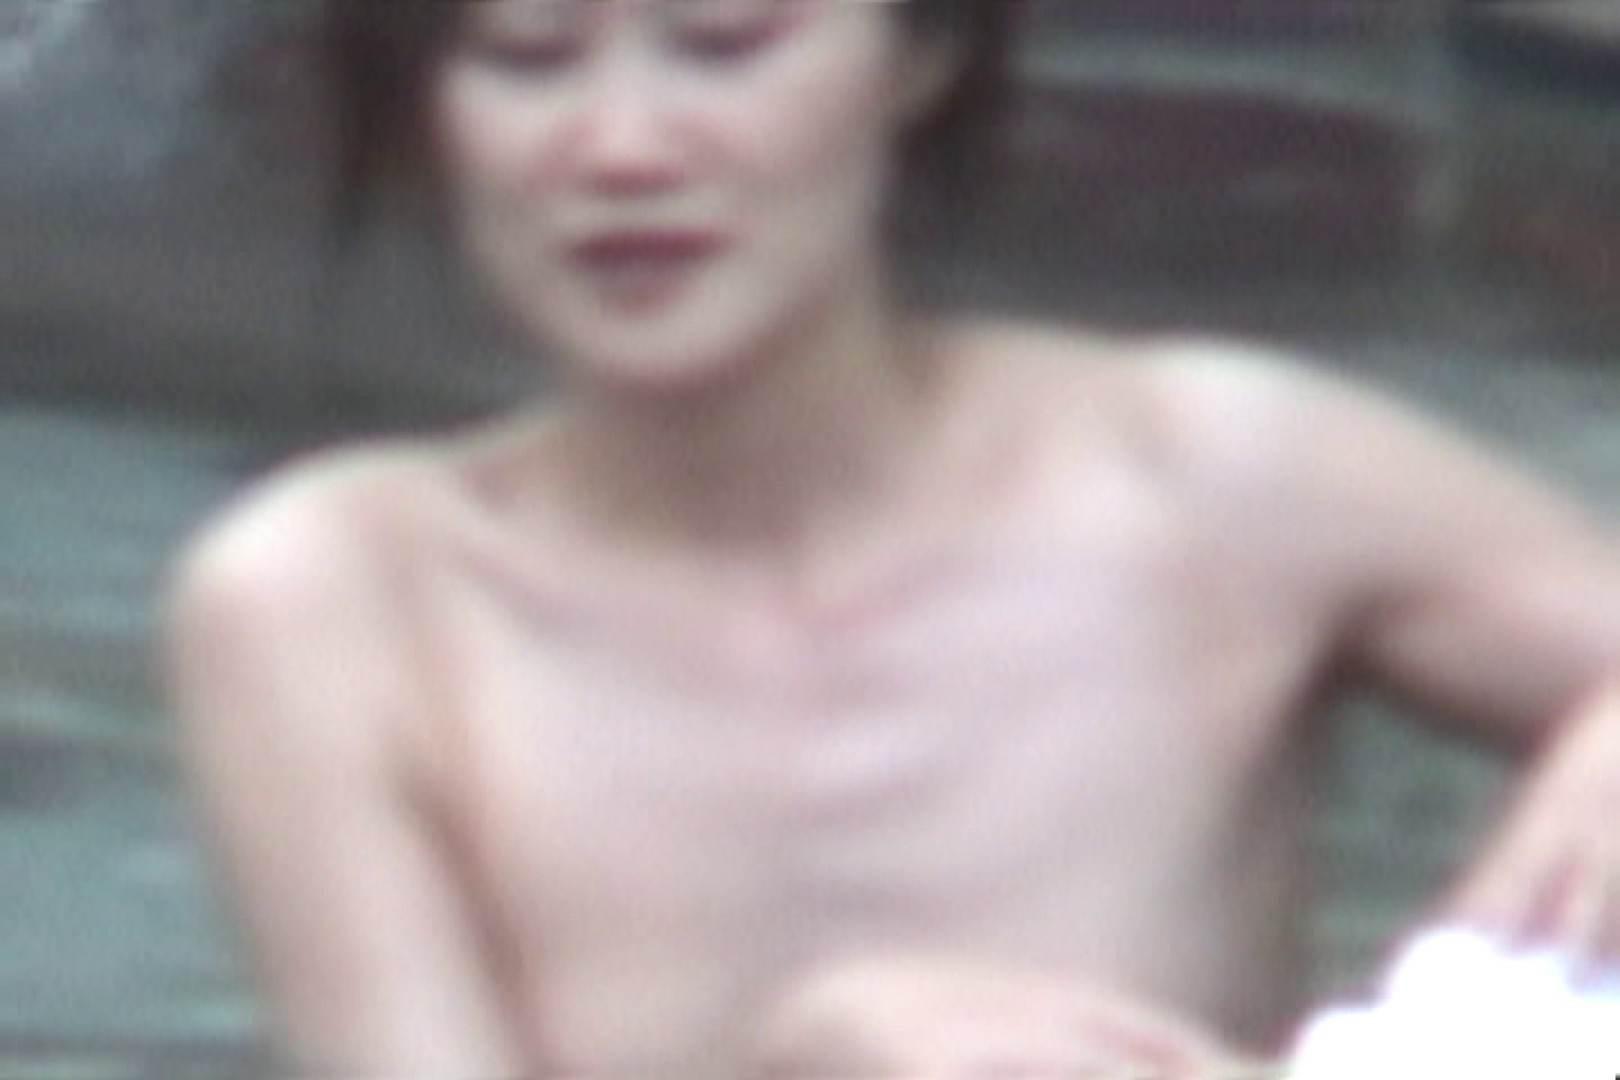 Aquaな露天風呂Vol.739 露天風呂突入 | 盗撮師作品  88pic 16